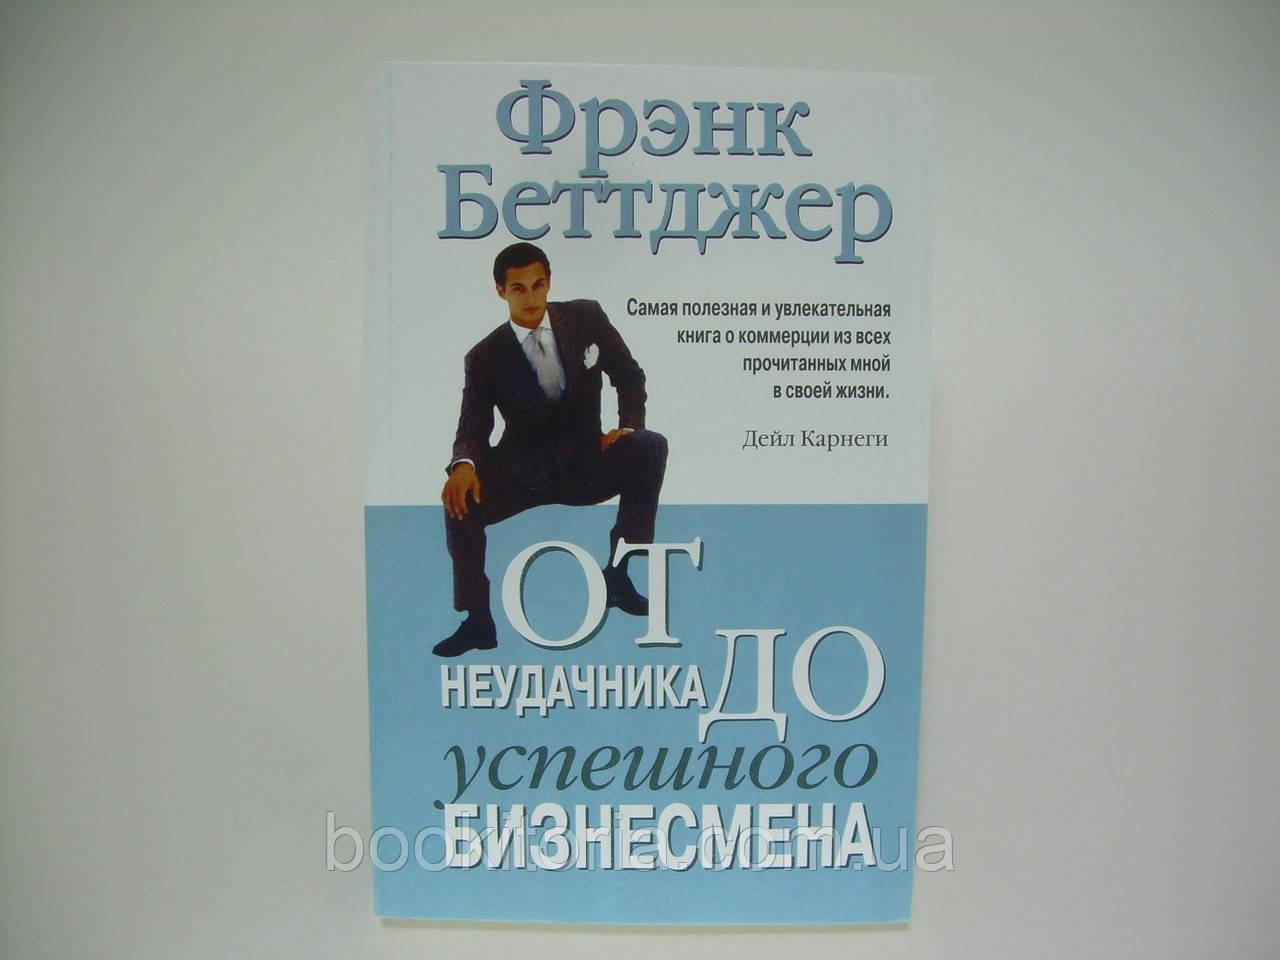 Беттджер Ф. От неудачника до успешного бизнесмена.